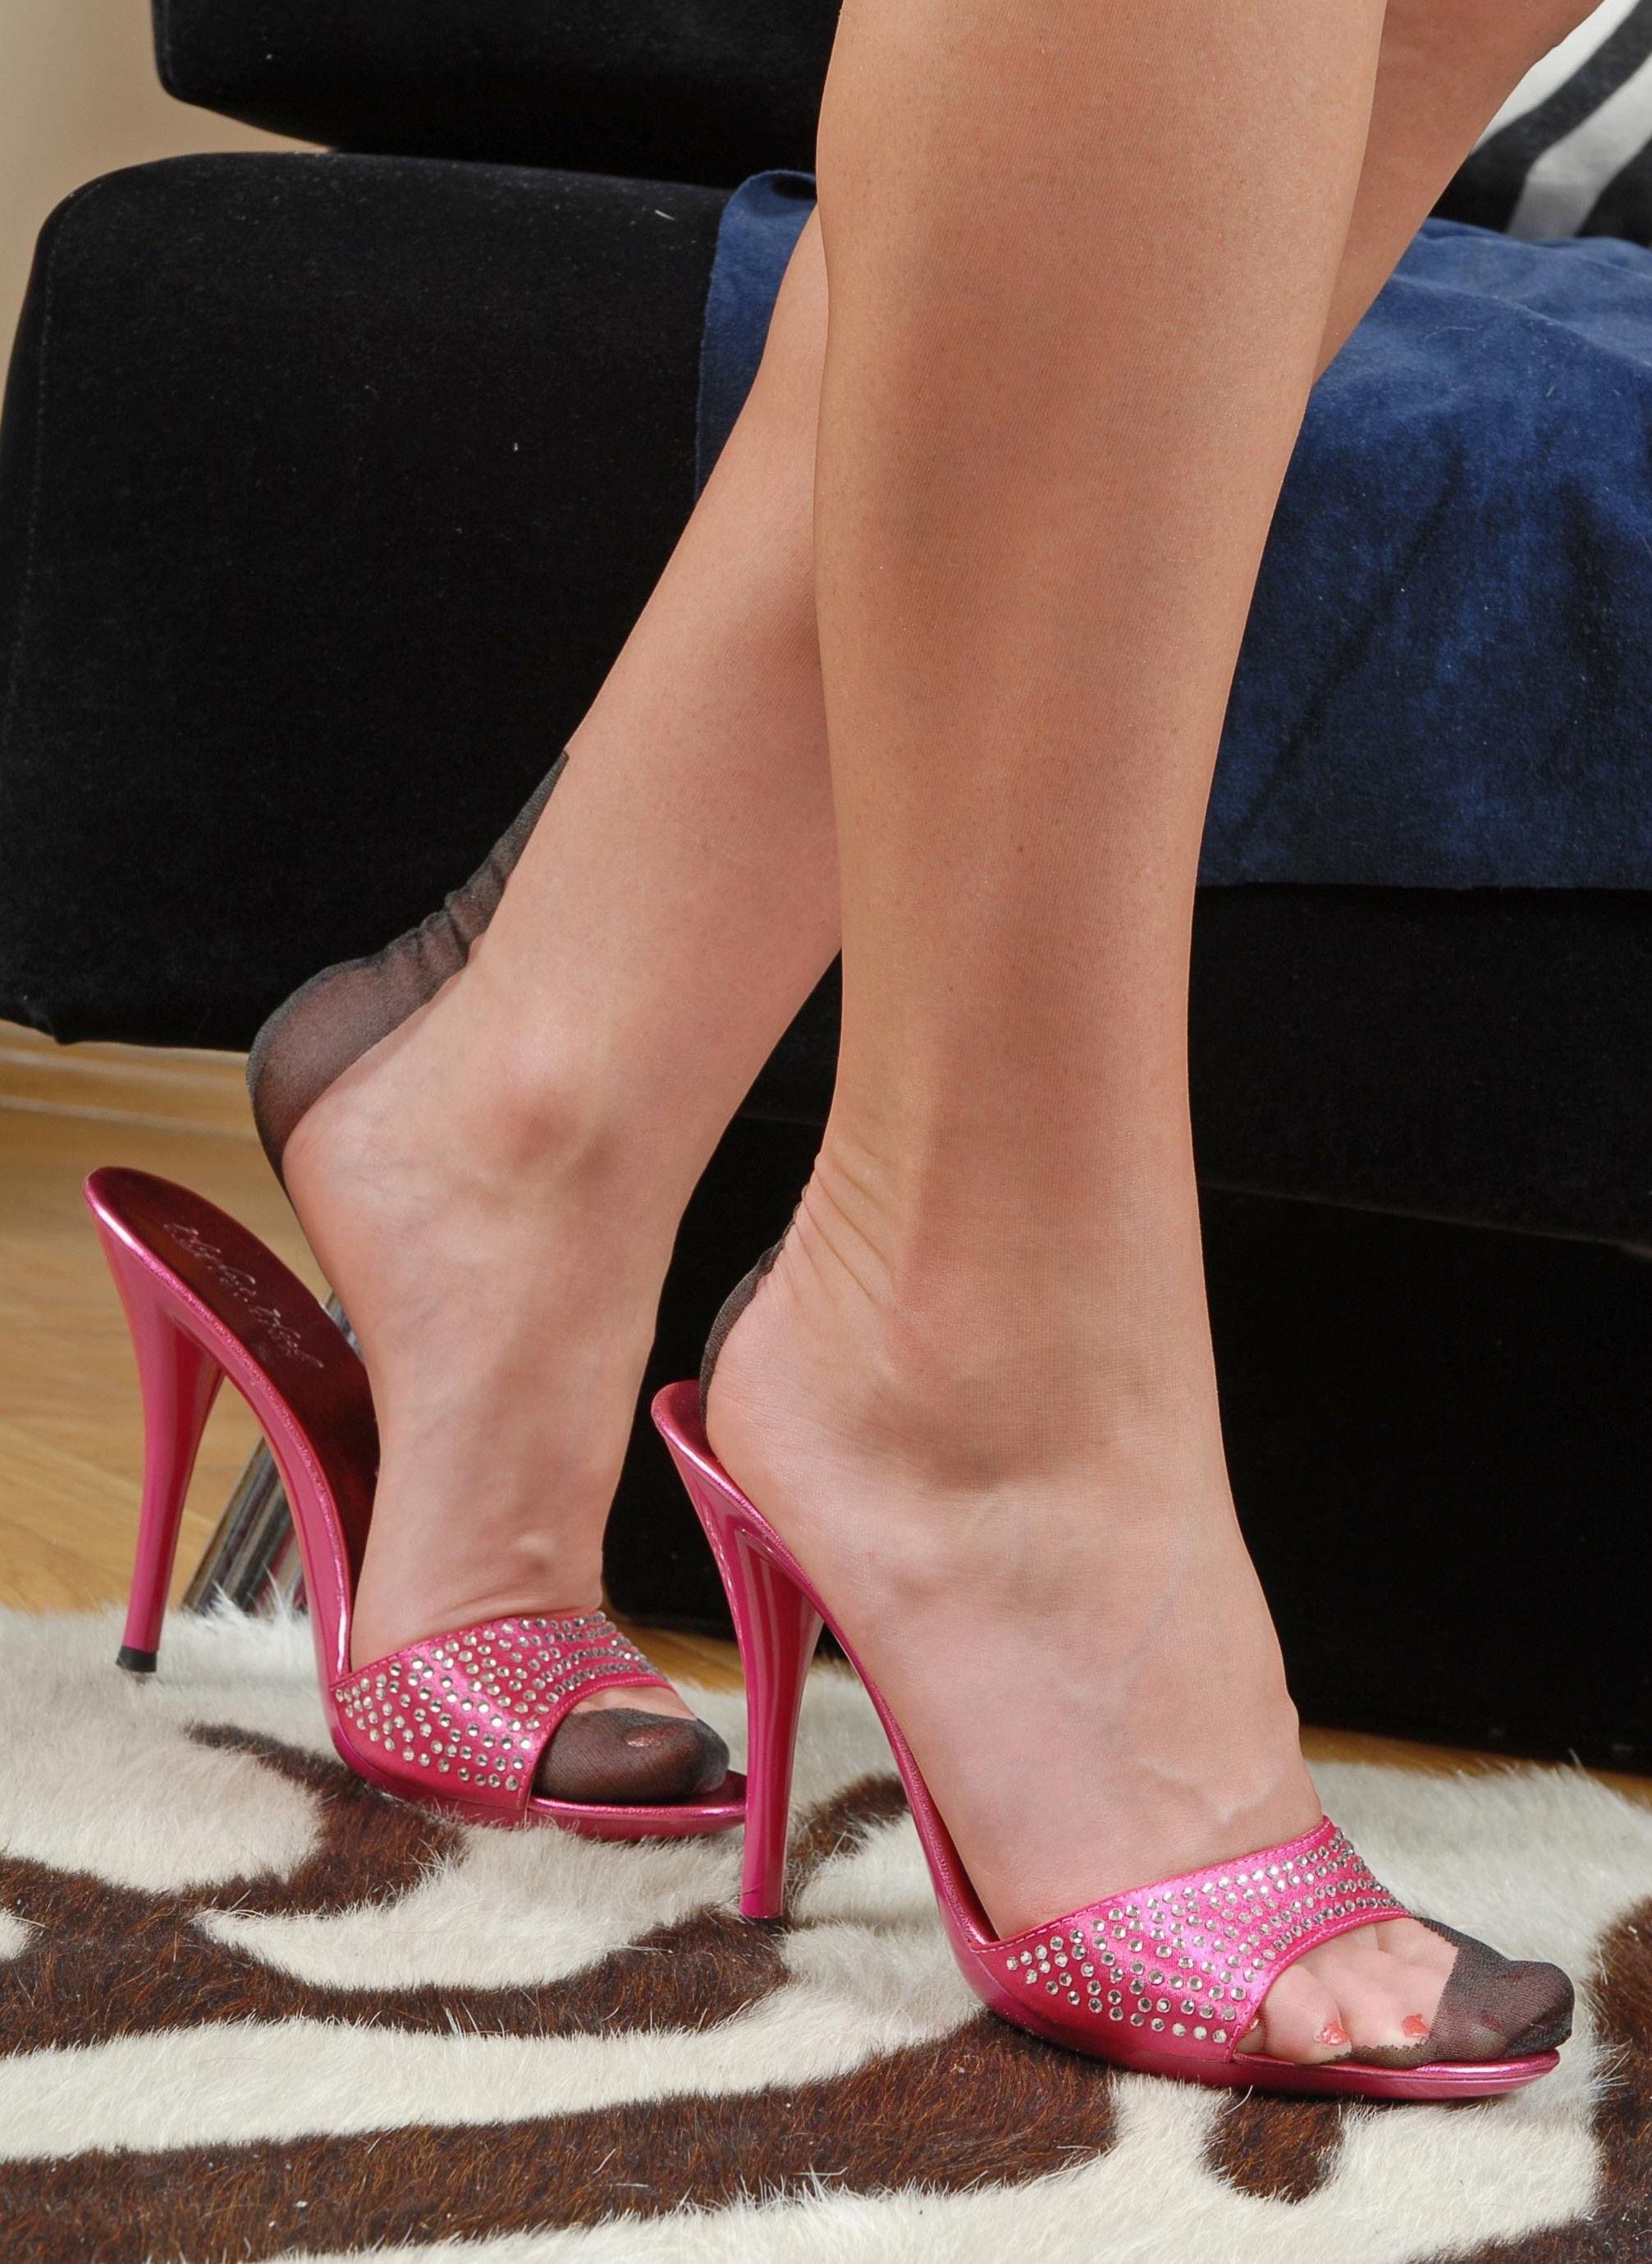 b91e892ea40fa Pantyhose Heels, Nylons, Nylon Stockings, Hot Heels, Womens High Heels,  Girls